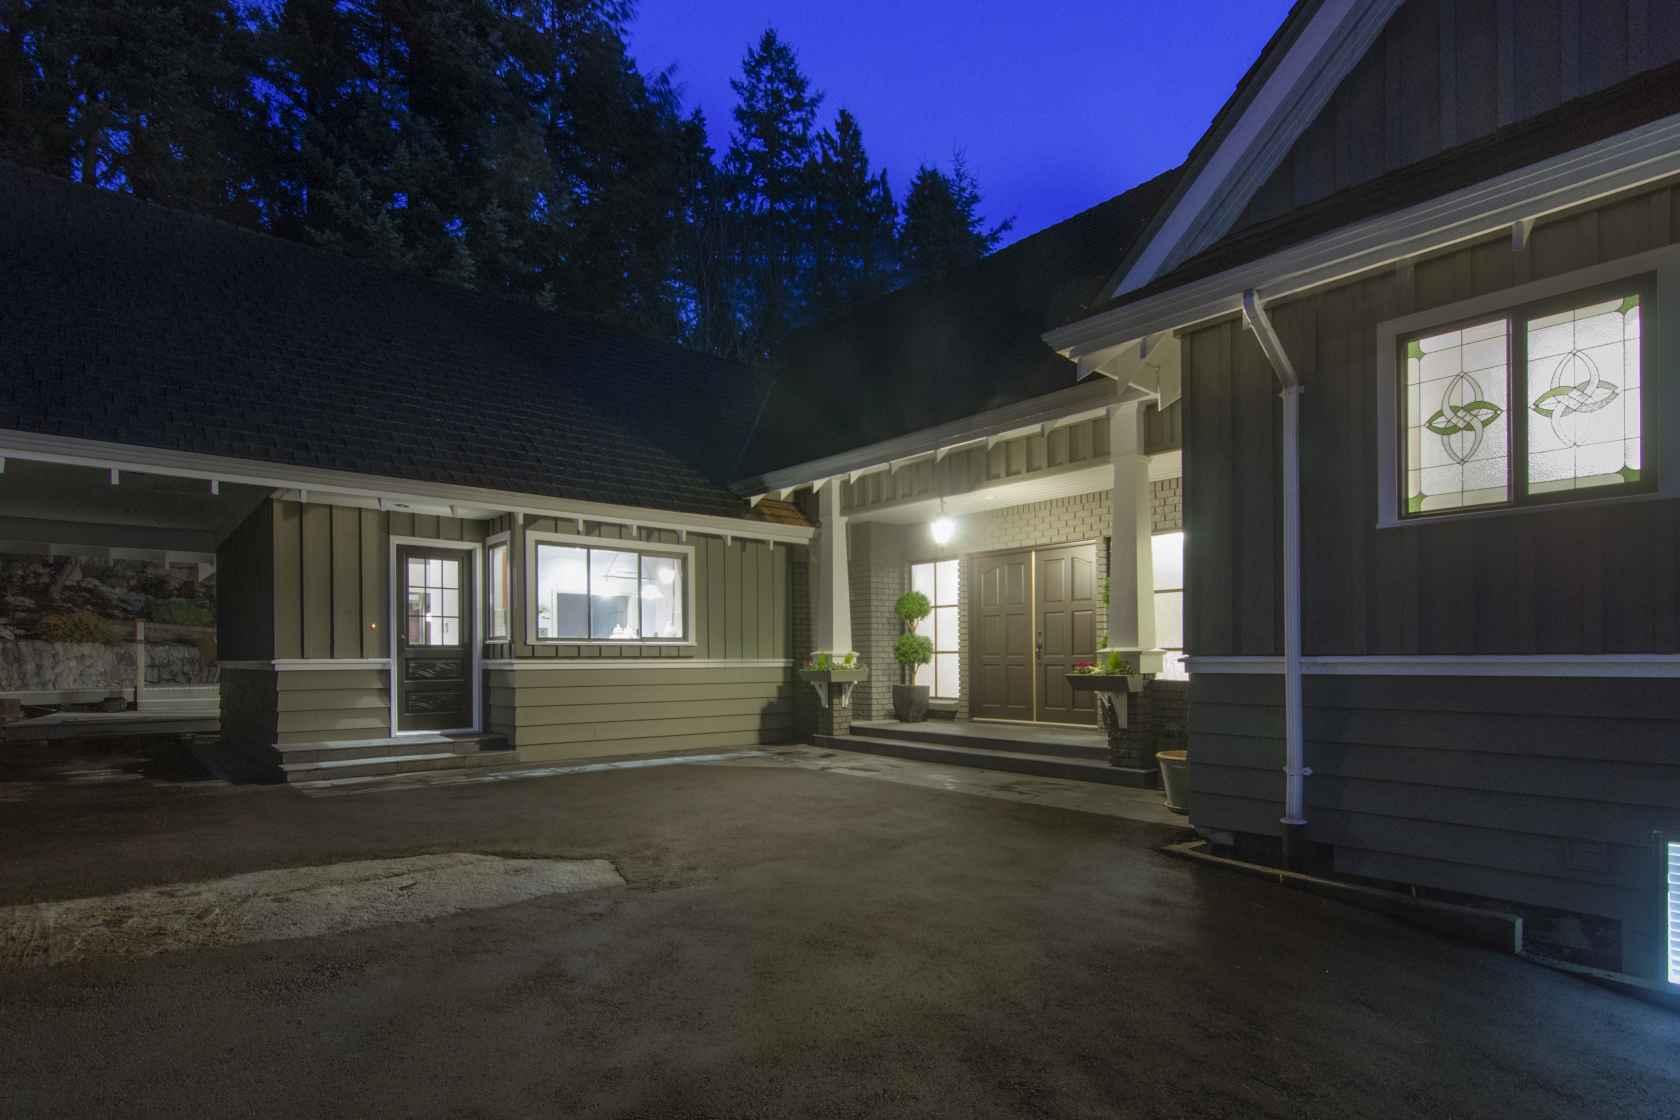 027 at 4660 Willow Creek Road, Rockridge, West Vancouver